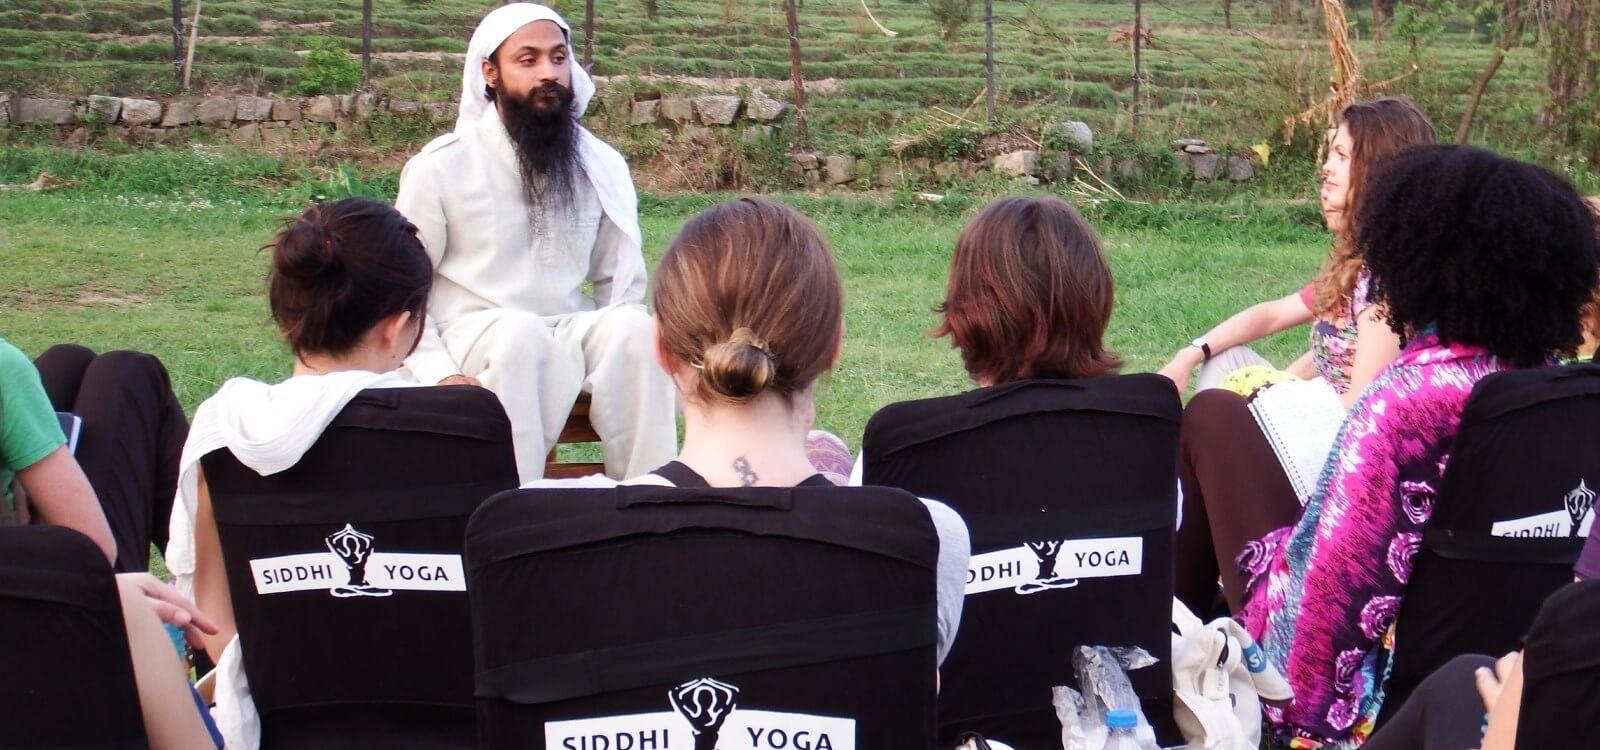 indian philosophy teacher guru mukh